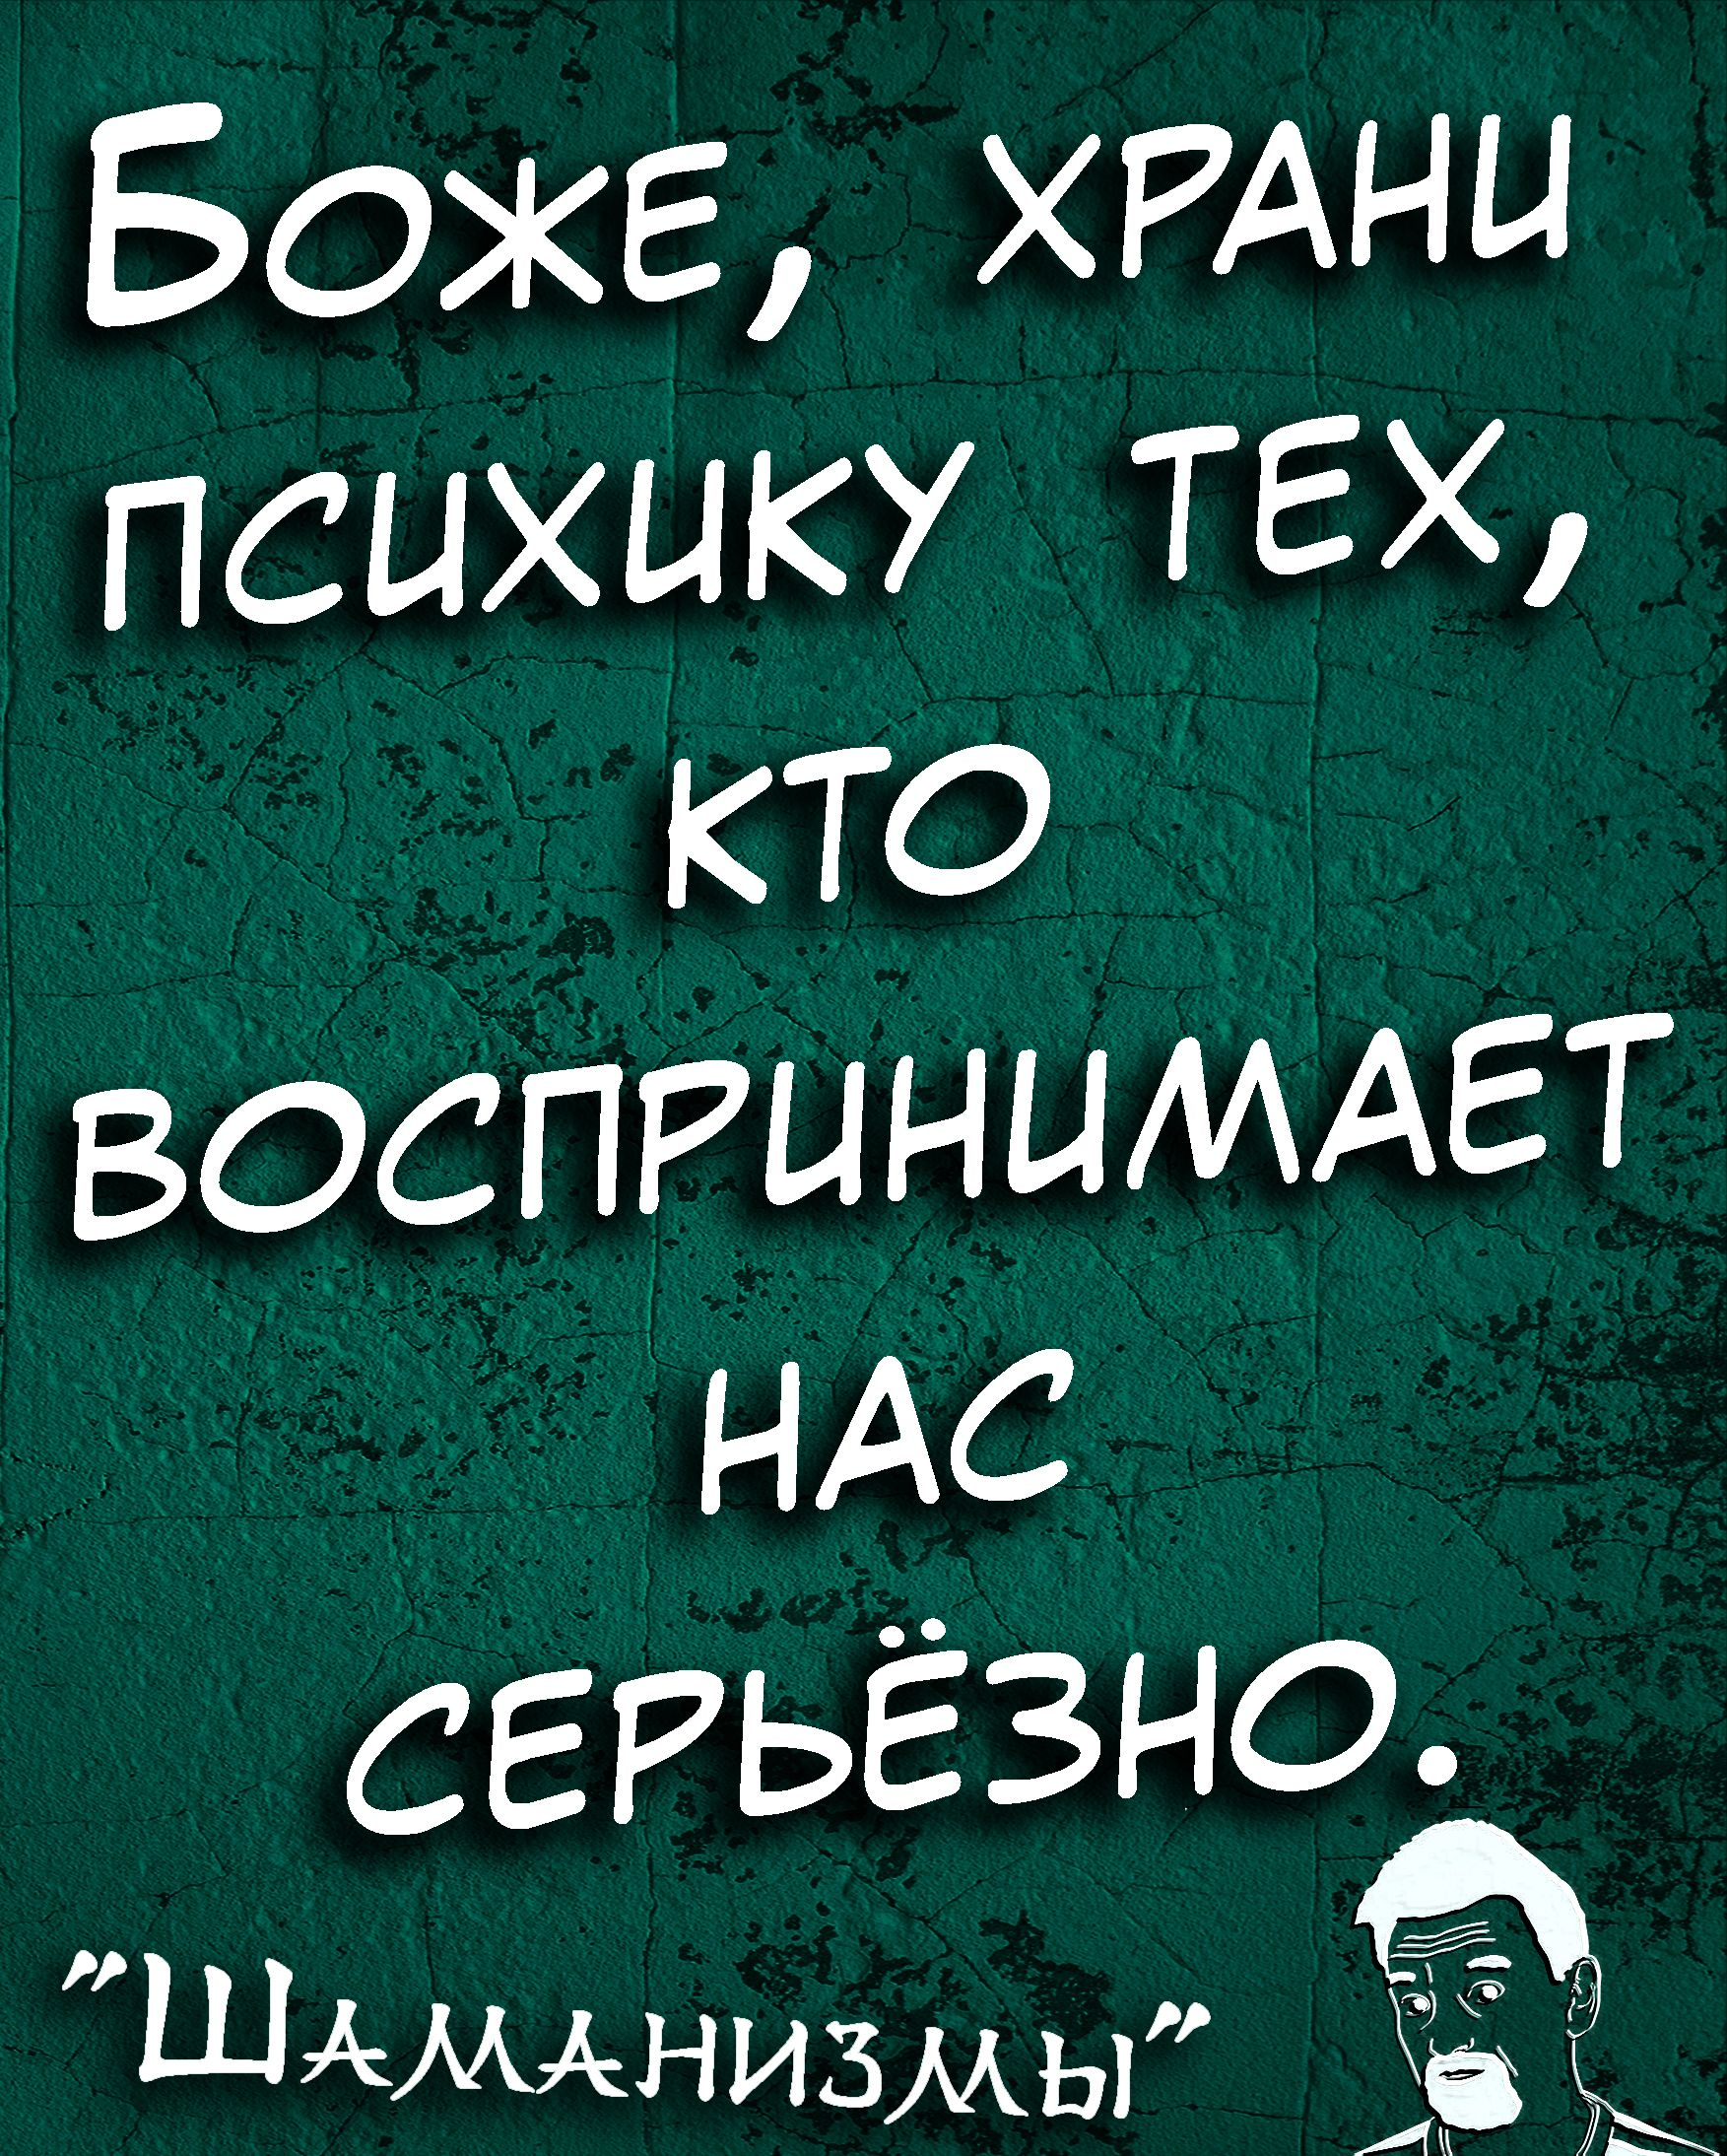 Shamanizmy Shutki Prikol Yumor Jokes Funny Humor Memes Quotations Quotes Phrase Of The Day